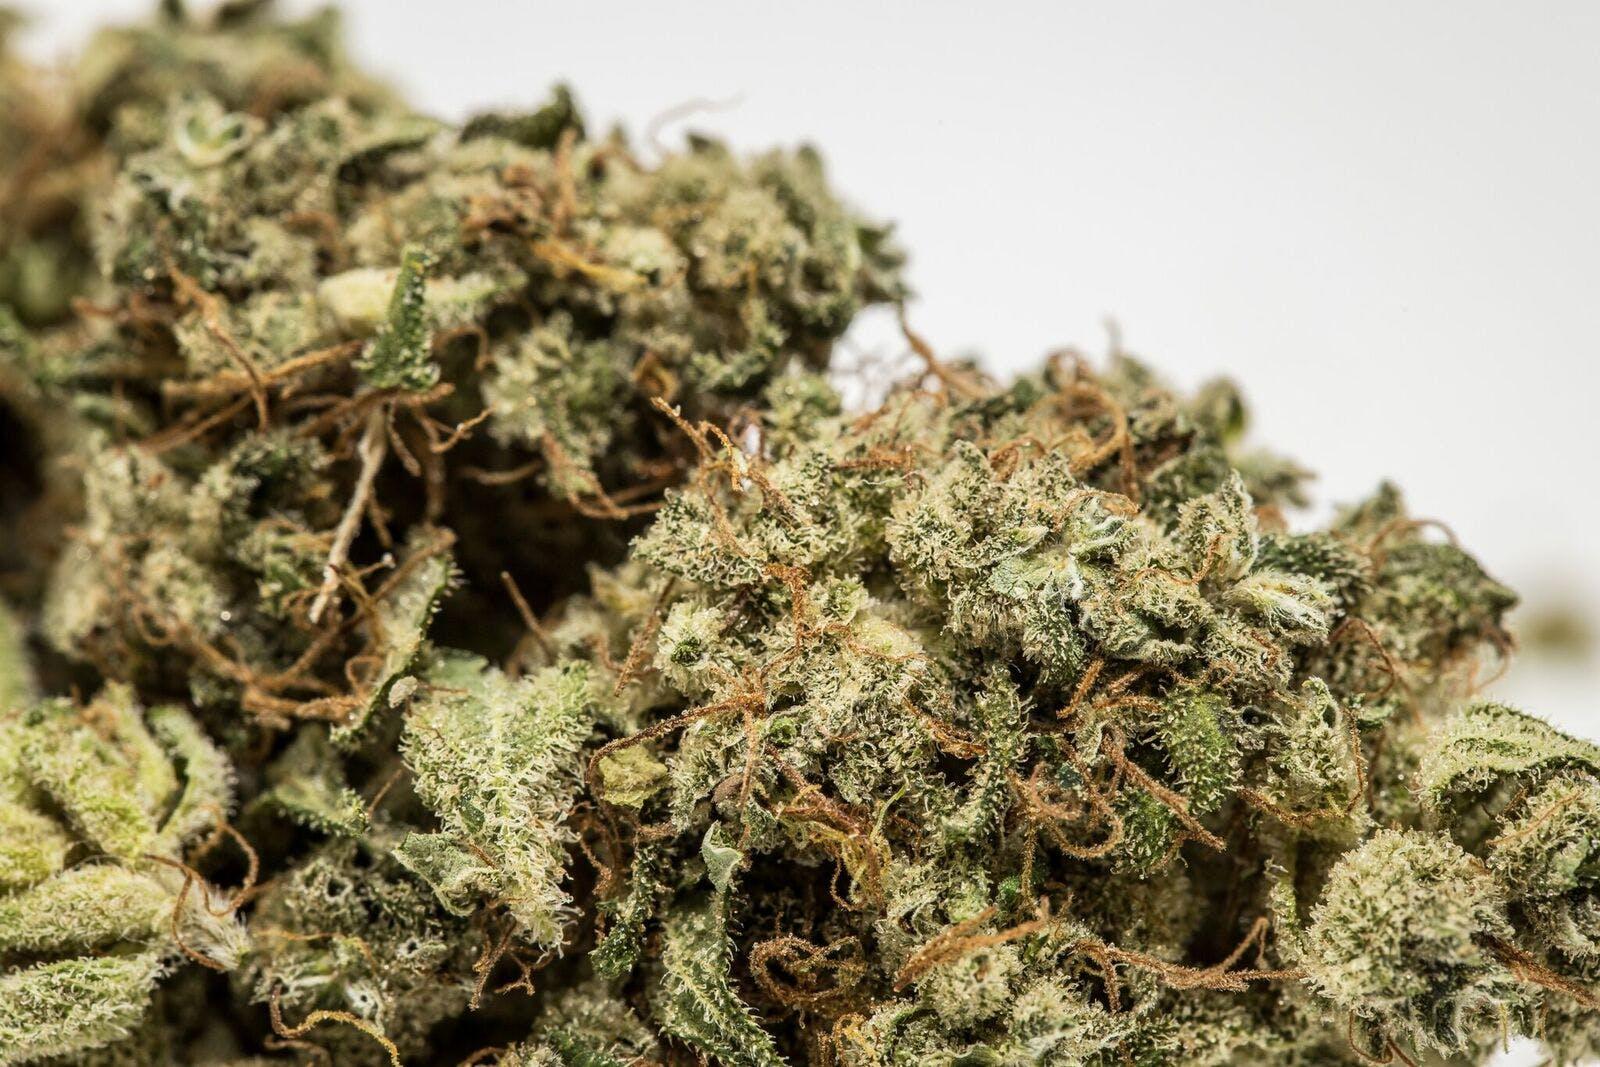 Pandora's Box Weed; Pandora's Box Cannabis Strain; Pandora's Box Sativa Marijuana Strain